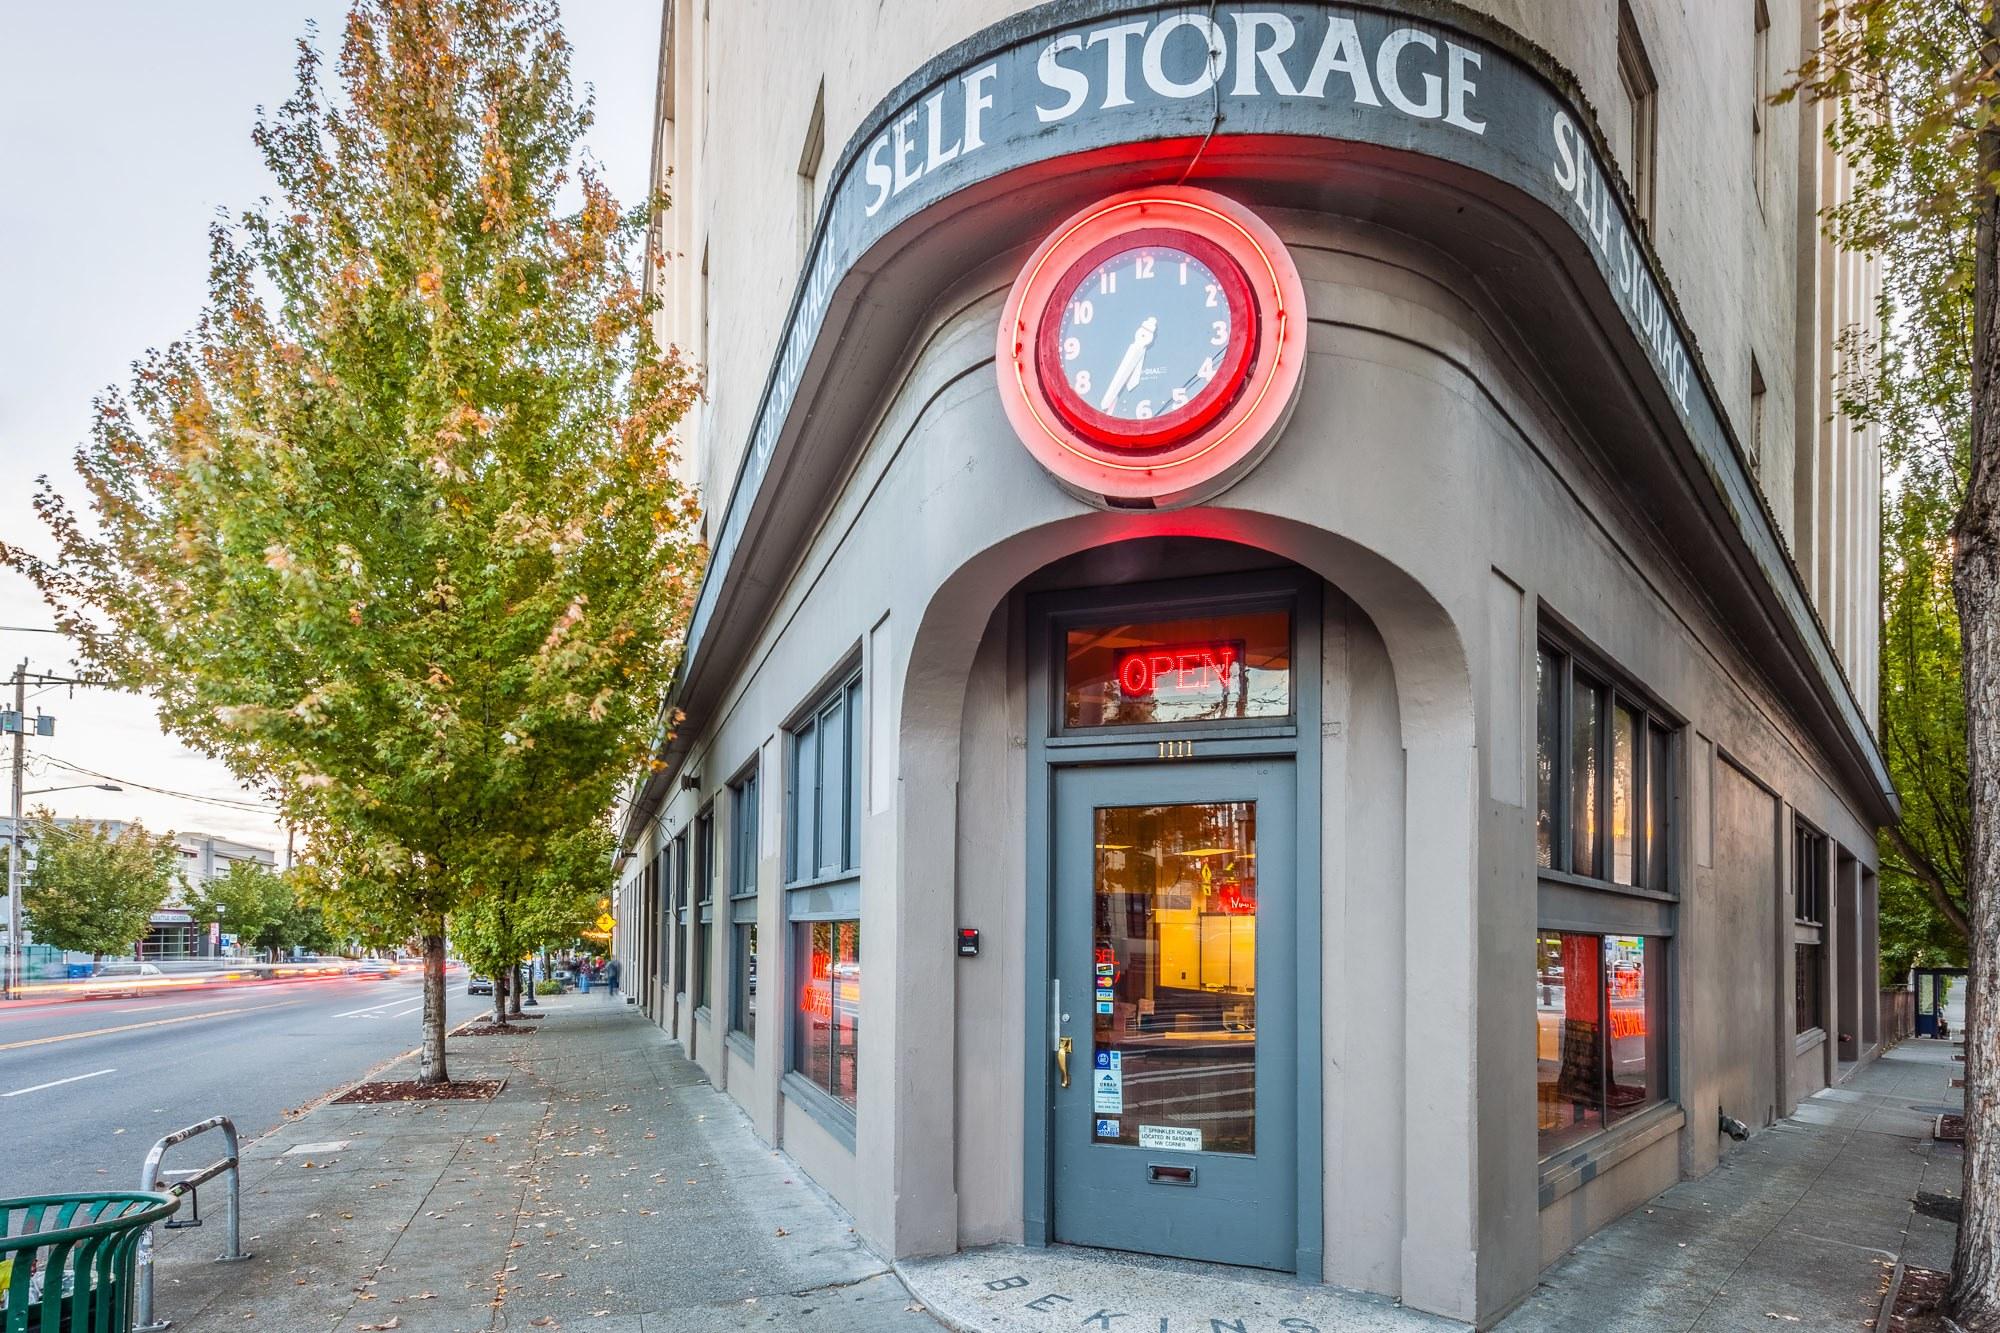 Exterior Self Storage facility Seattle, WA